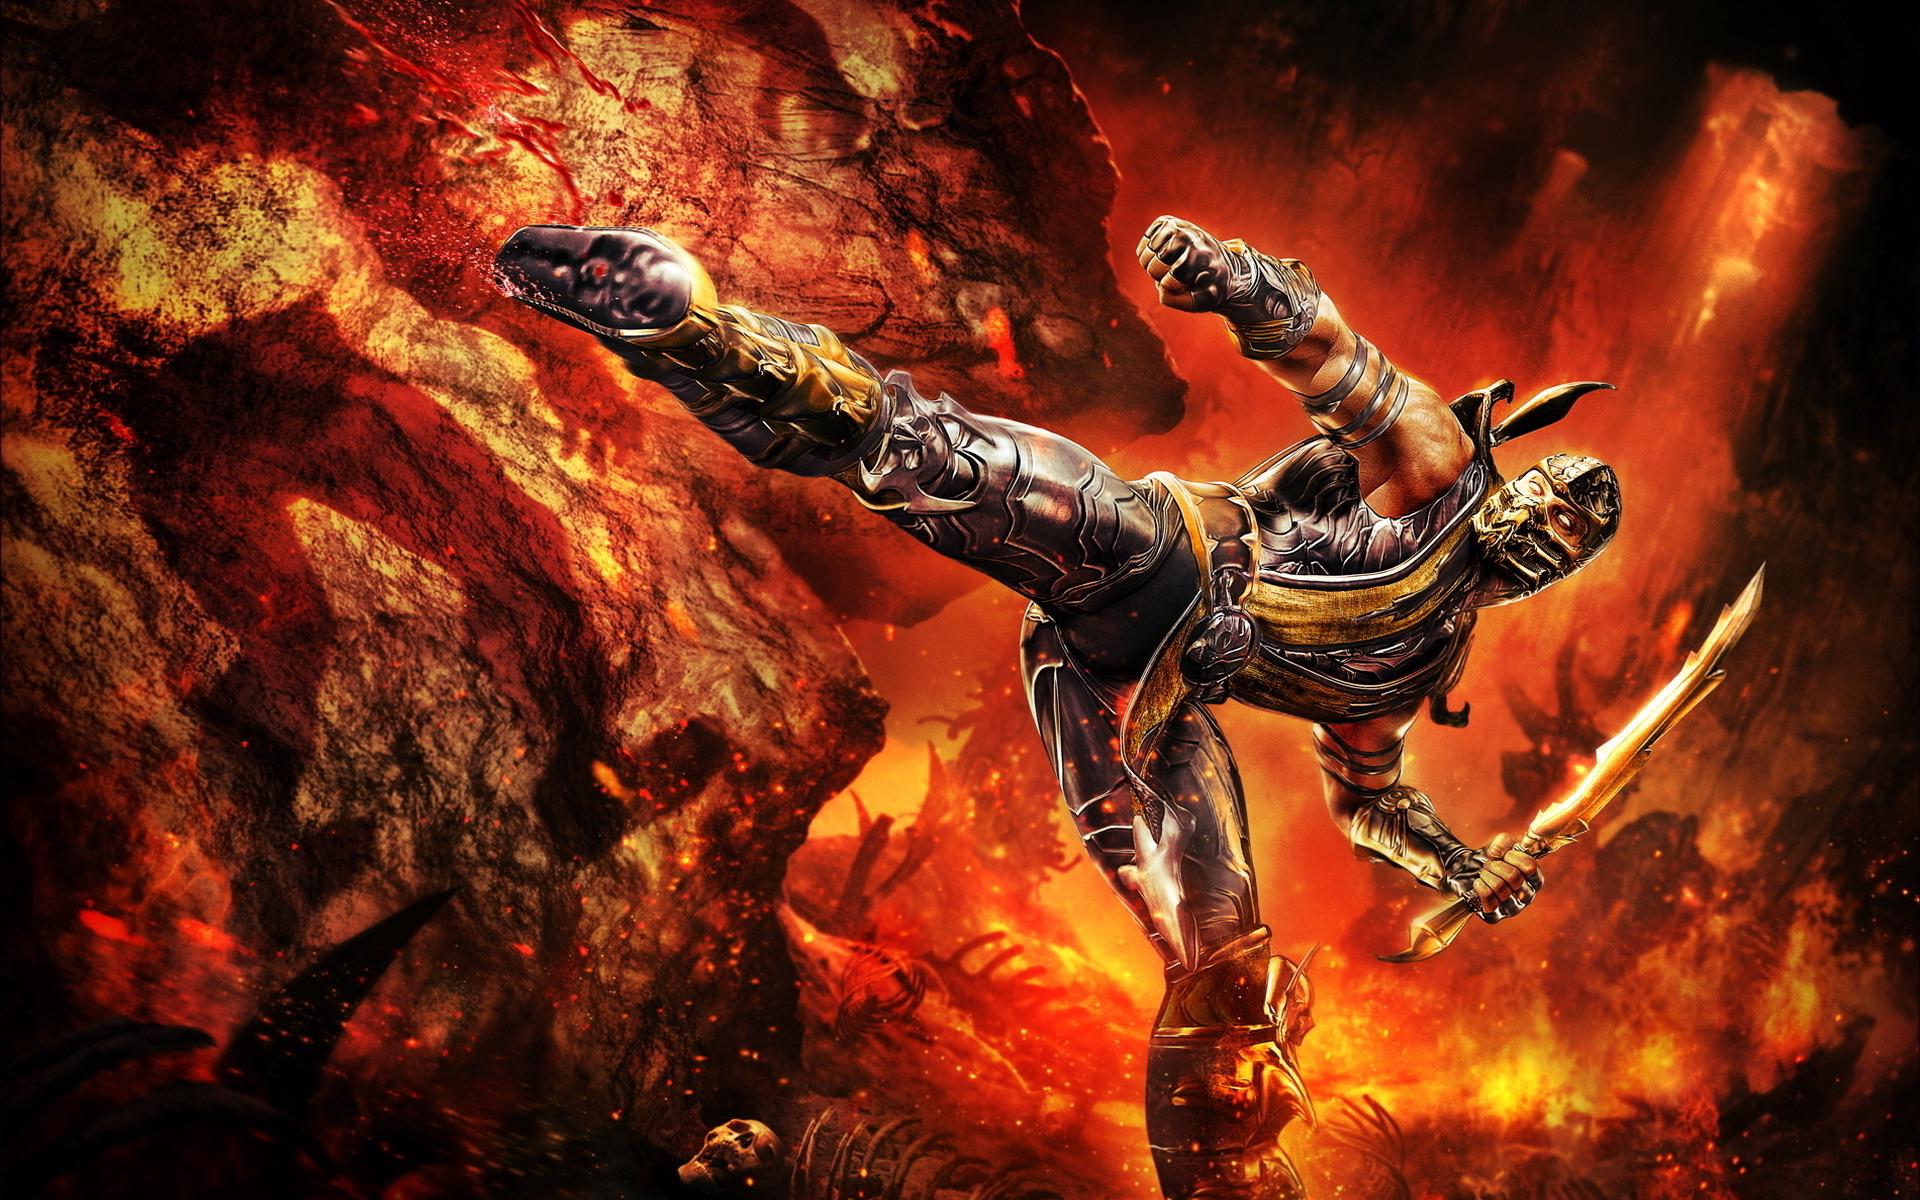 Mortal Kombat 9 wallpaper wallpaper hd background desktop 1920x1200